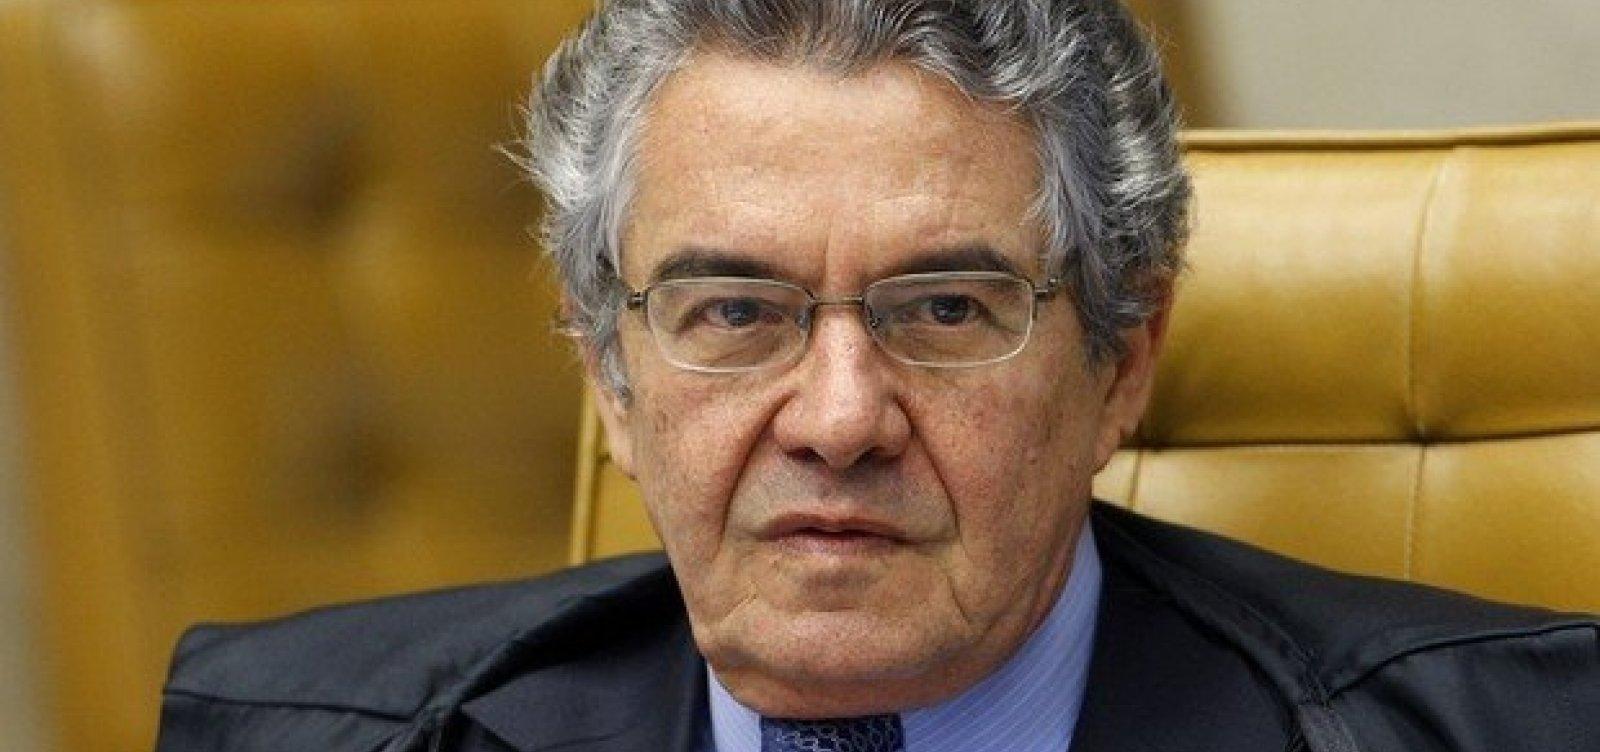 'Ruim para ele, para Presidência e para STF', diz Mello sobre aceno de Bolsonaro a Moro